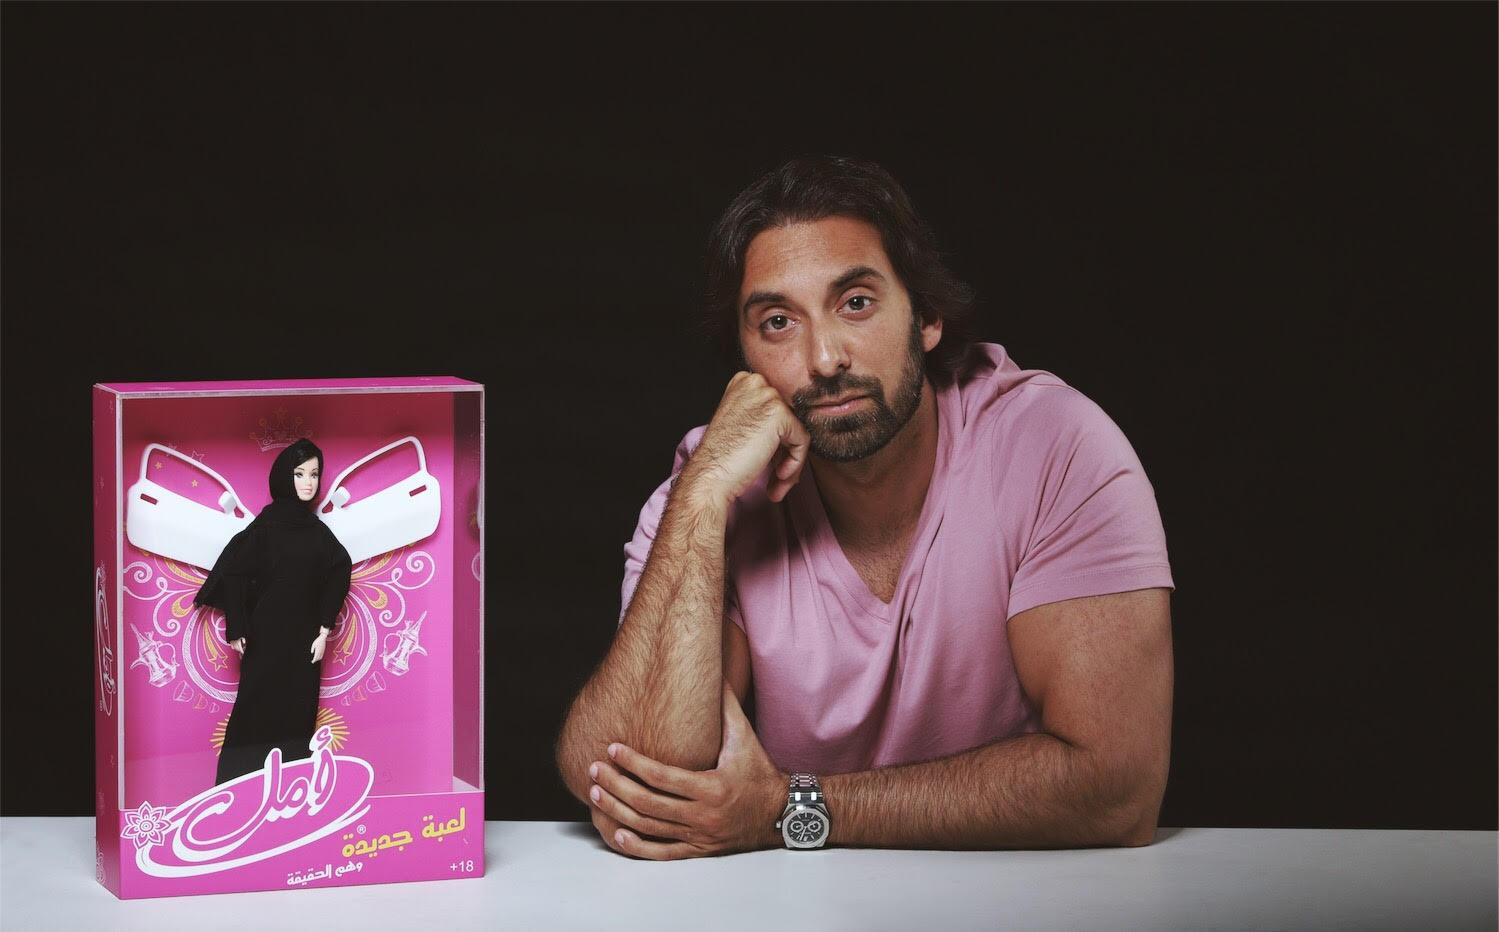 Sheikhs on Trampolines & Barbies in Abayas: Saudi Artist Khalid Zahid's Message